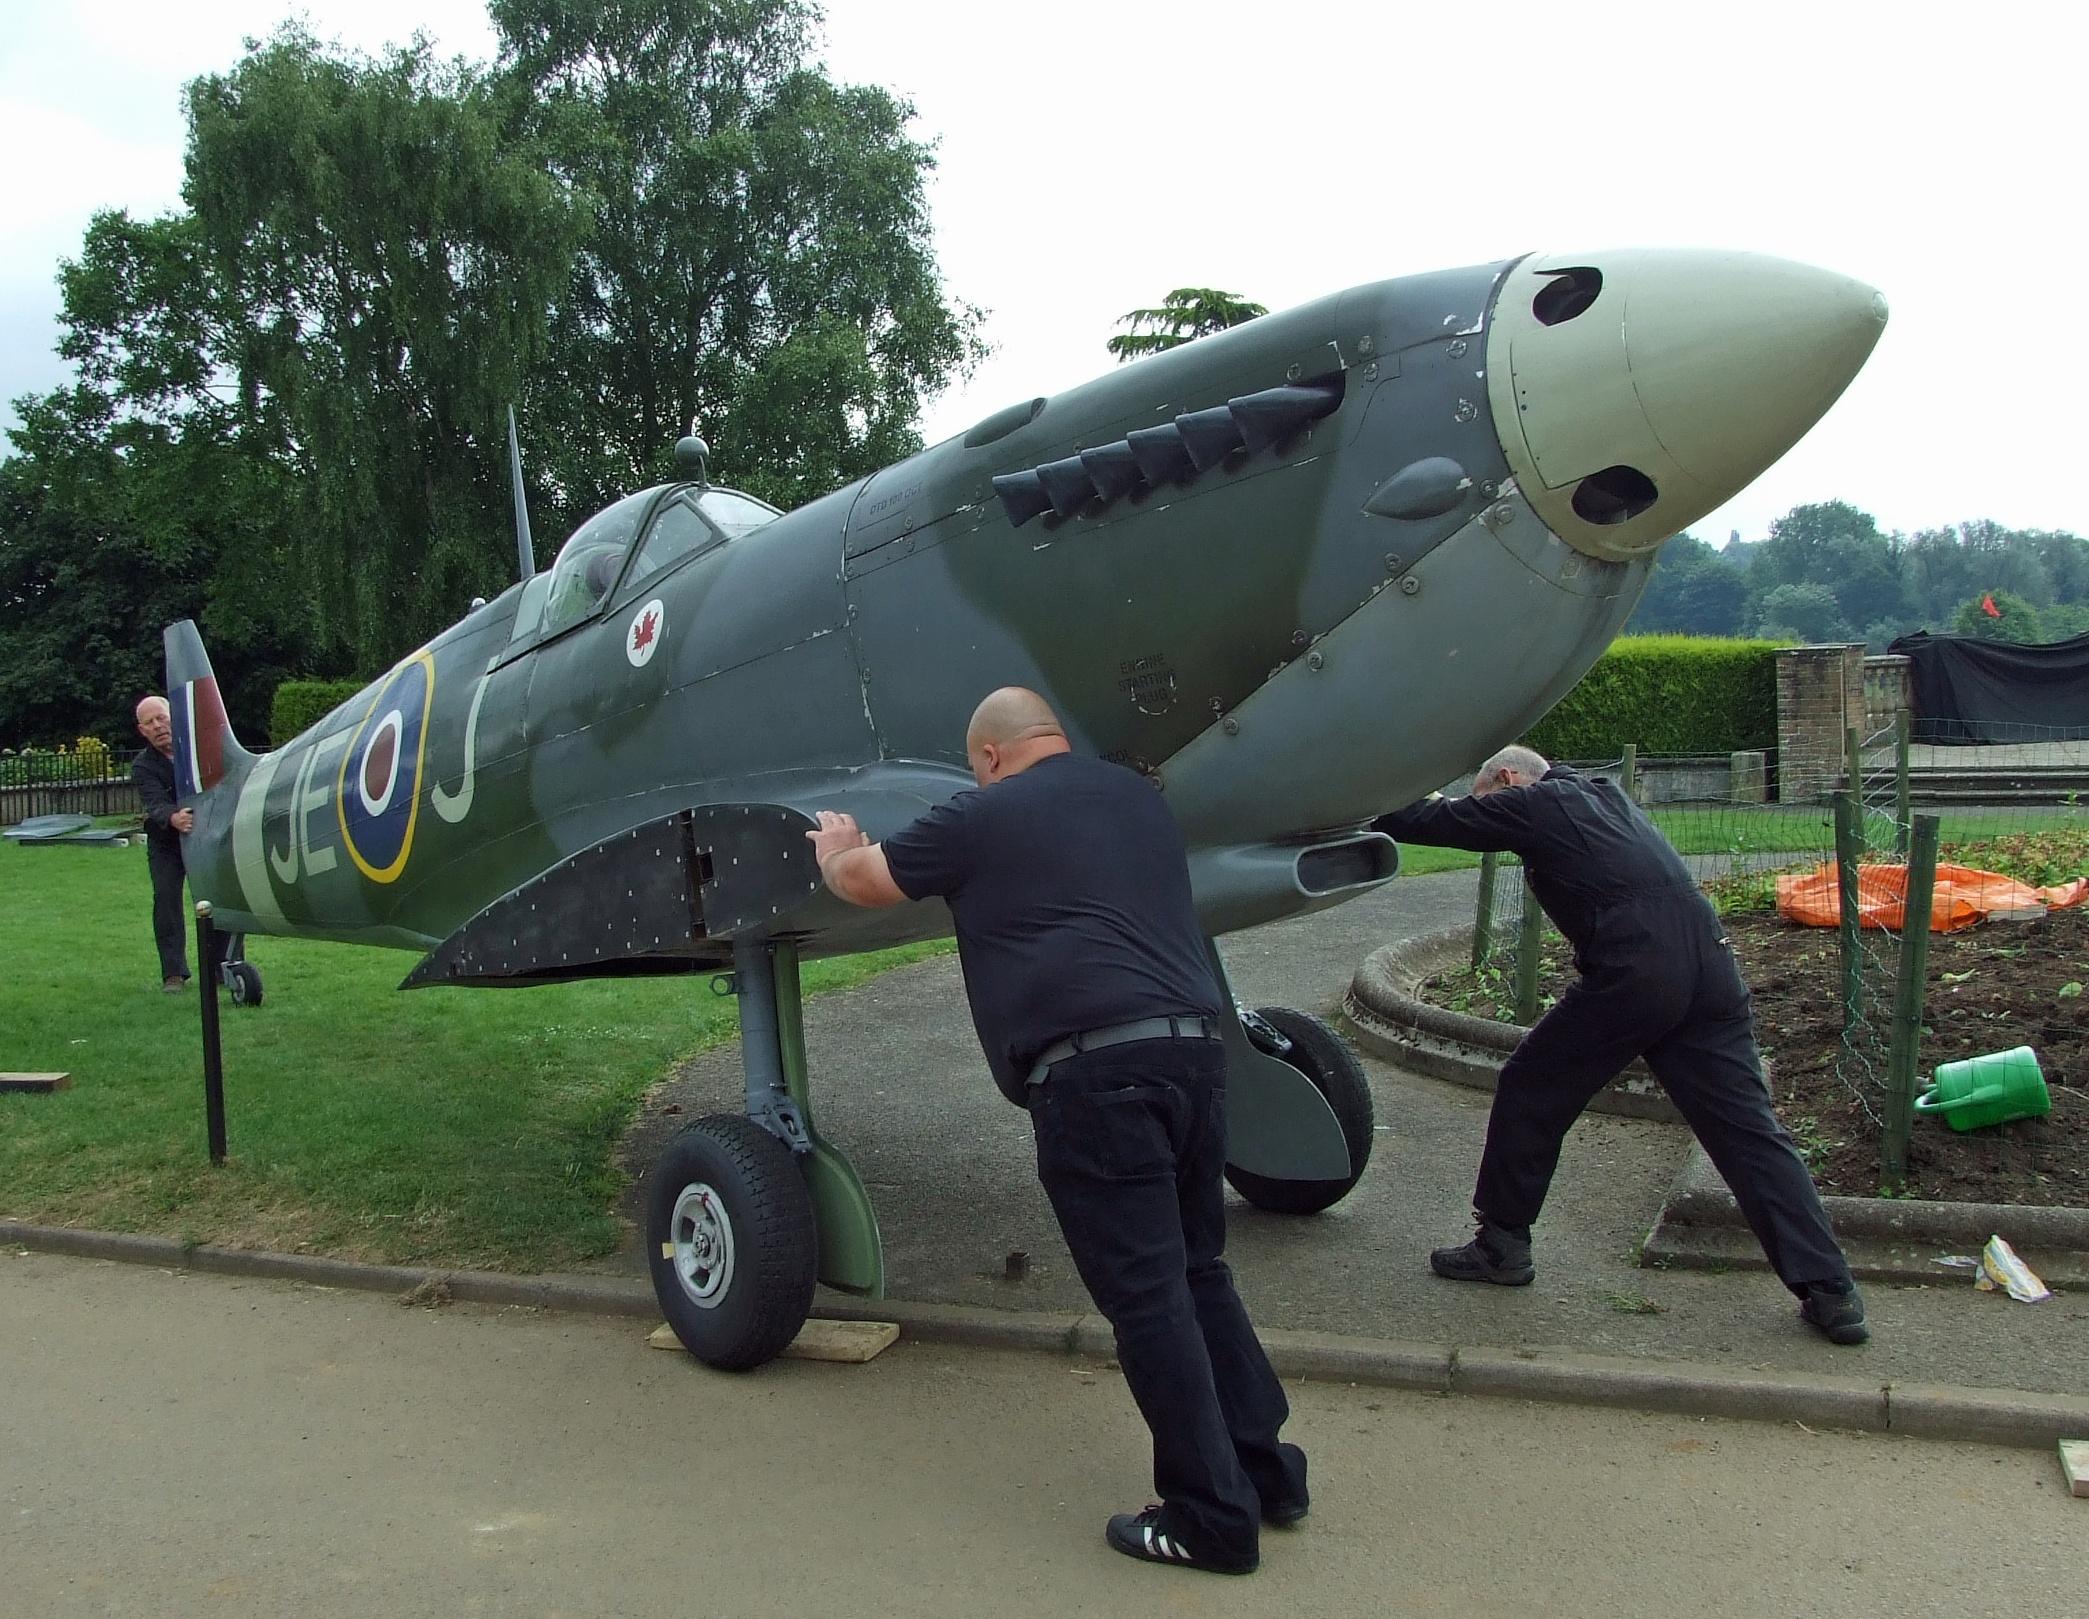 The Spitfire replica contained many original parts